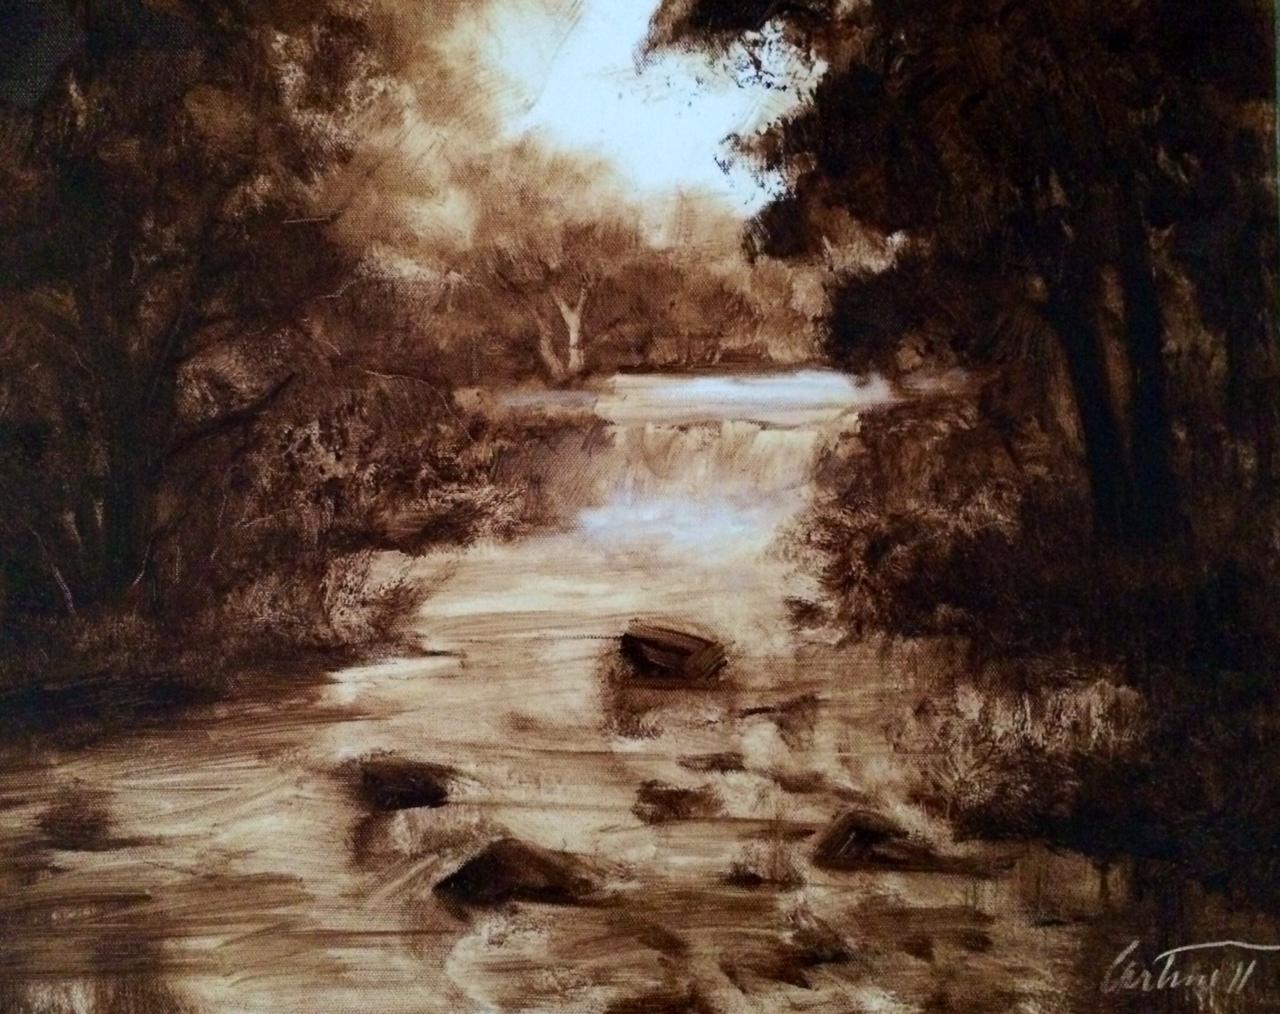 Monochrome Oil Painting